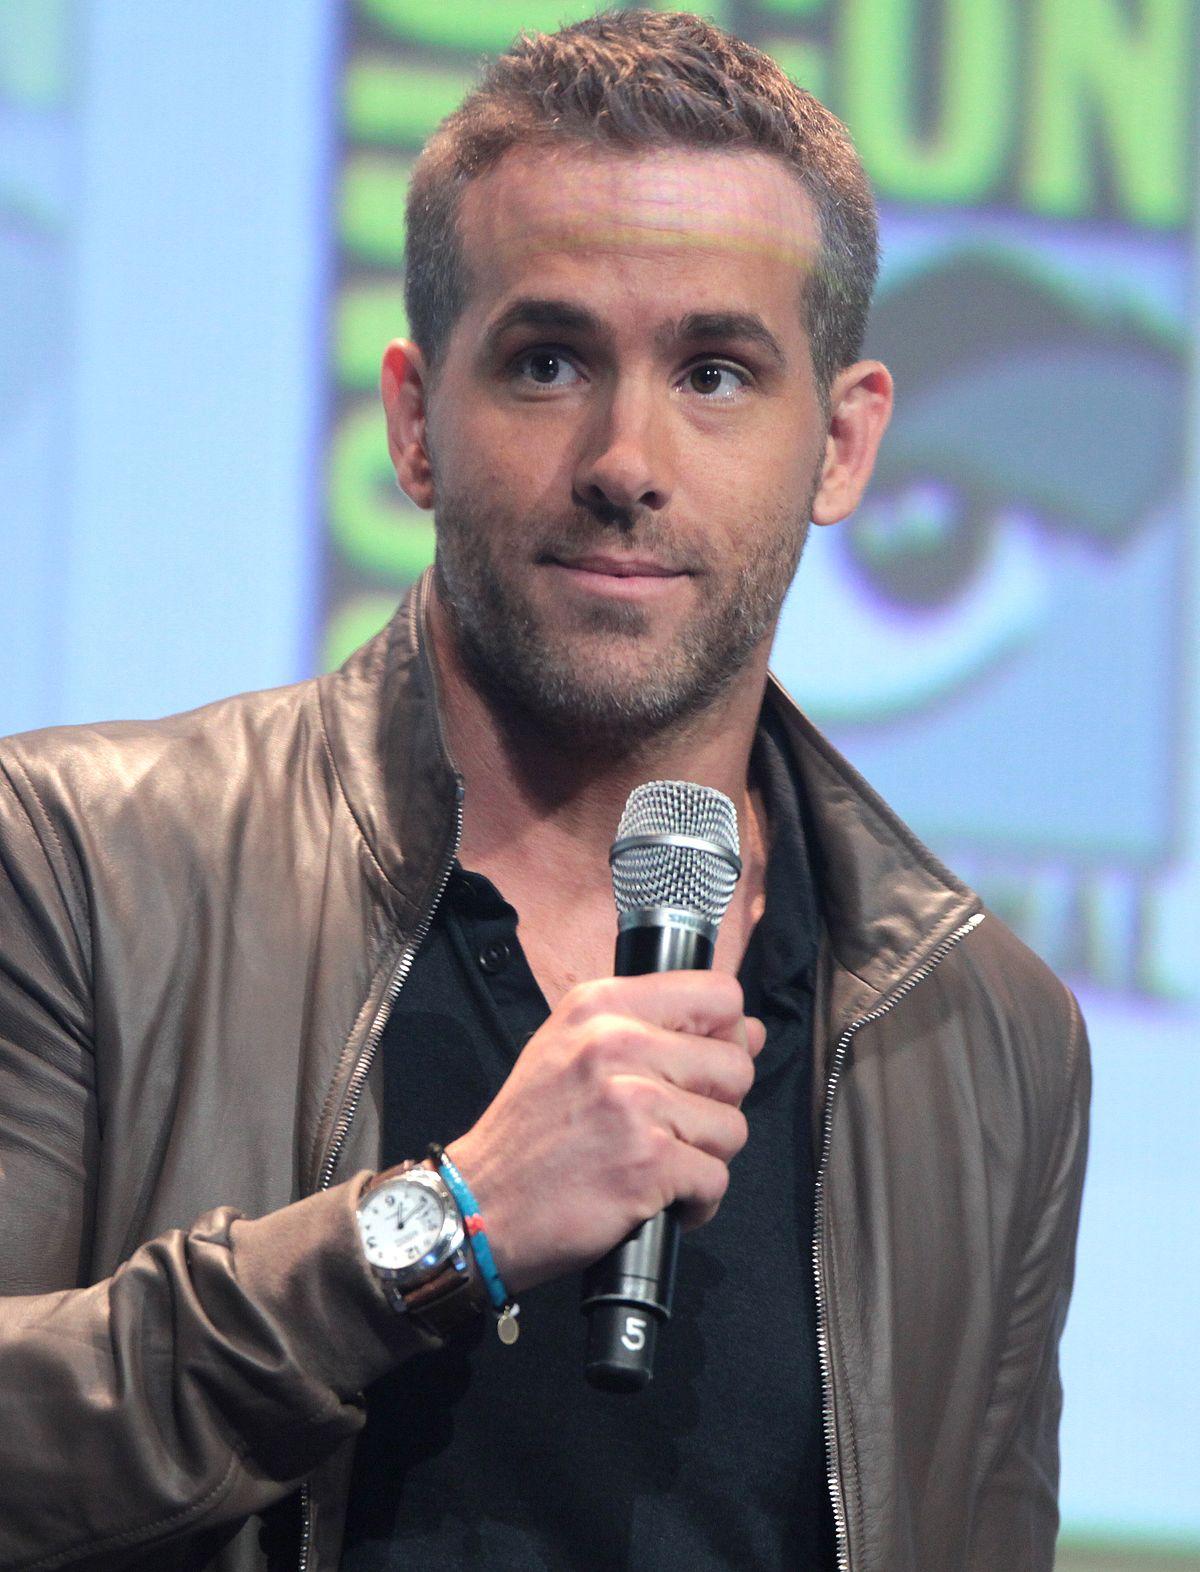 Ryan Reynolds Wikidata